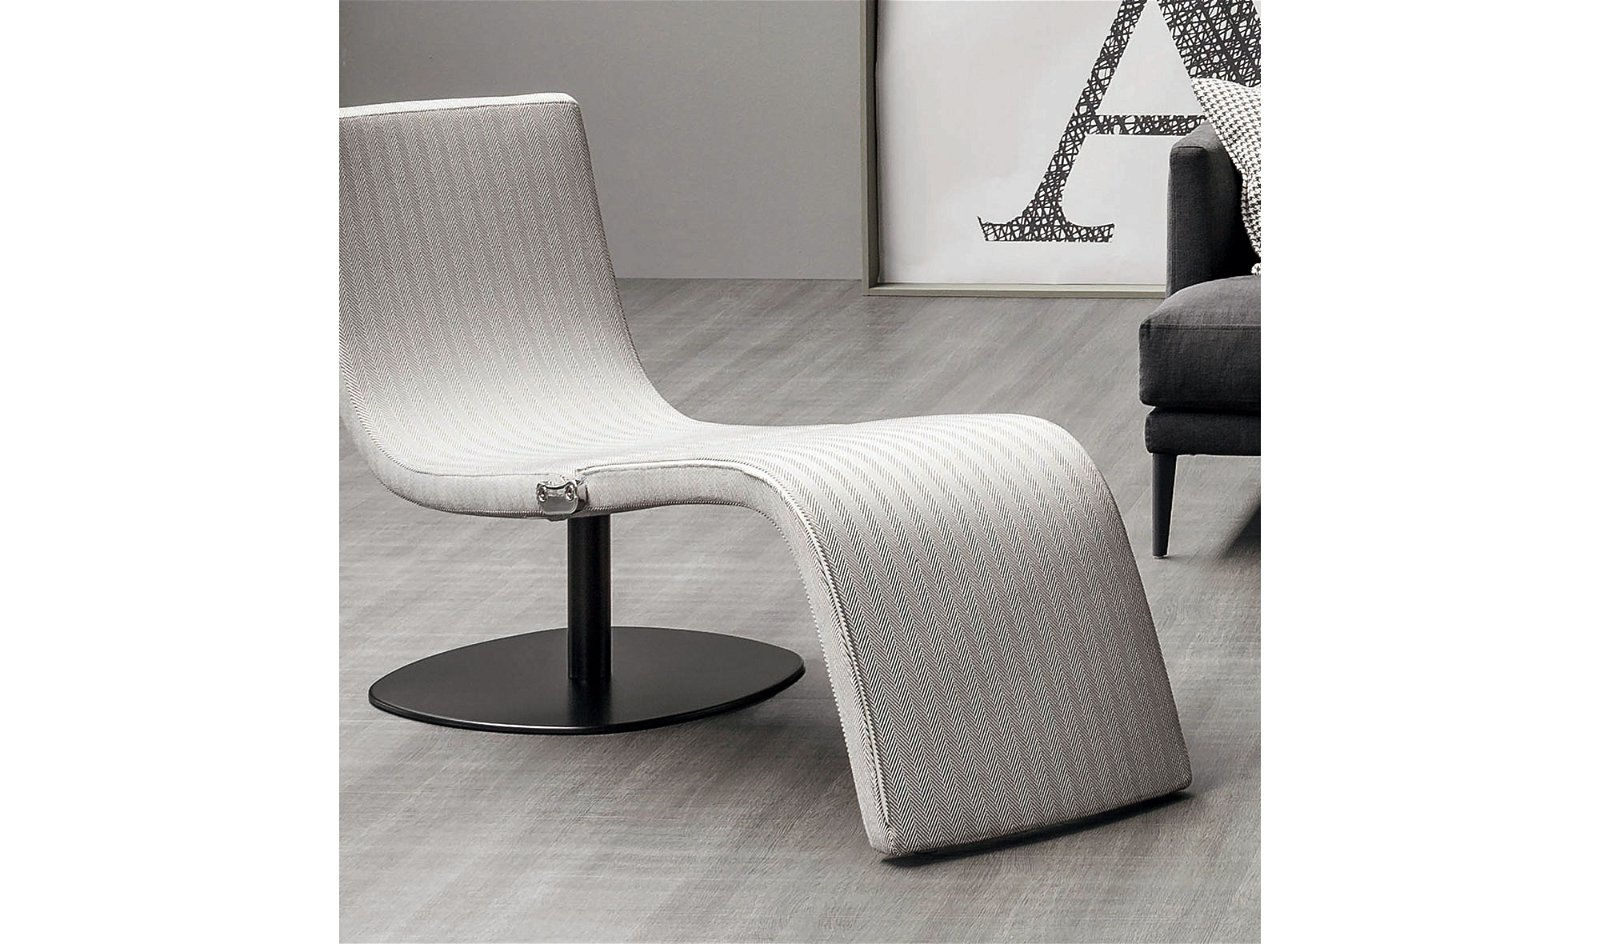 Chaise longue moderna Dragonfly Bonaldo